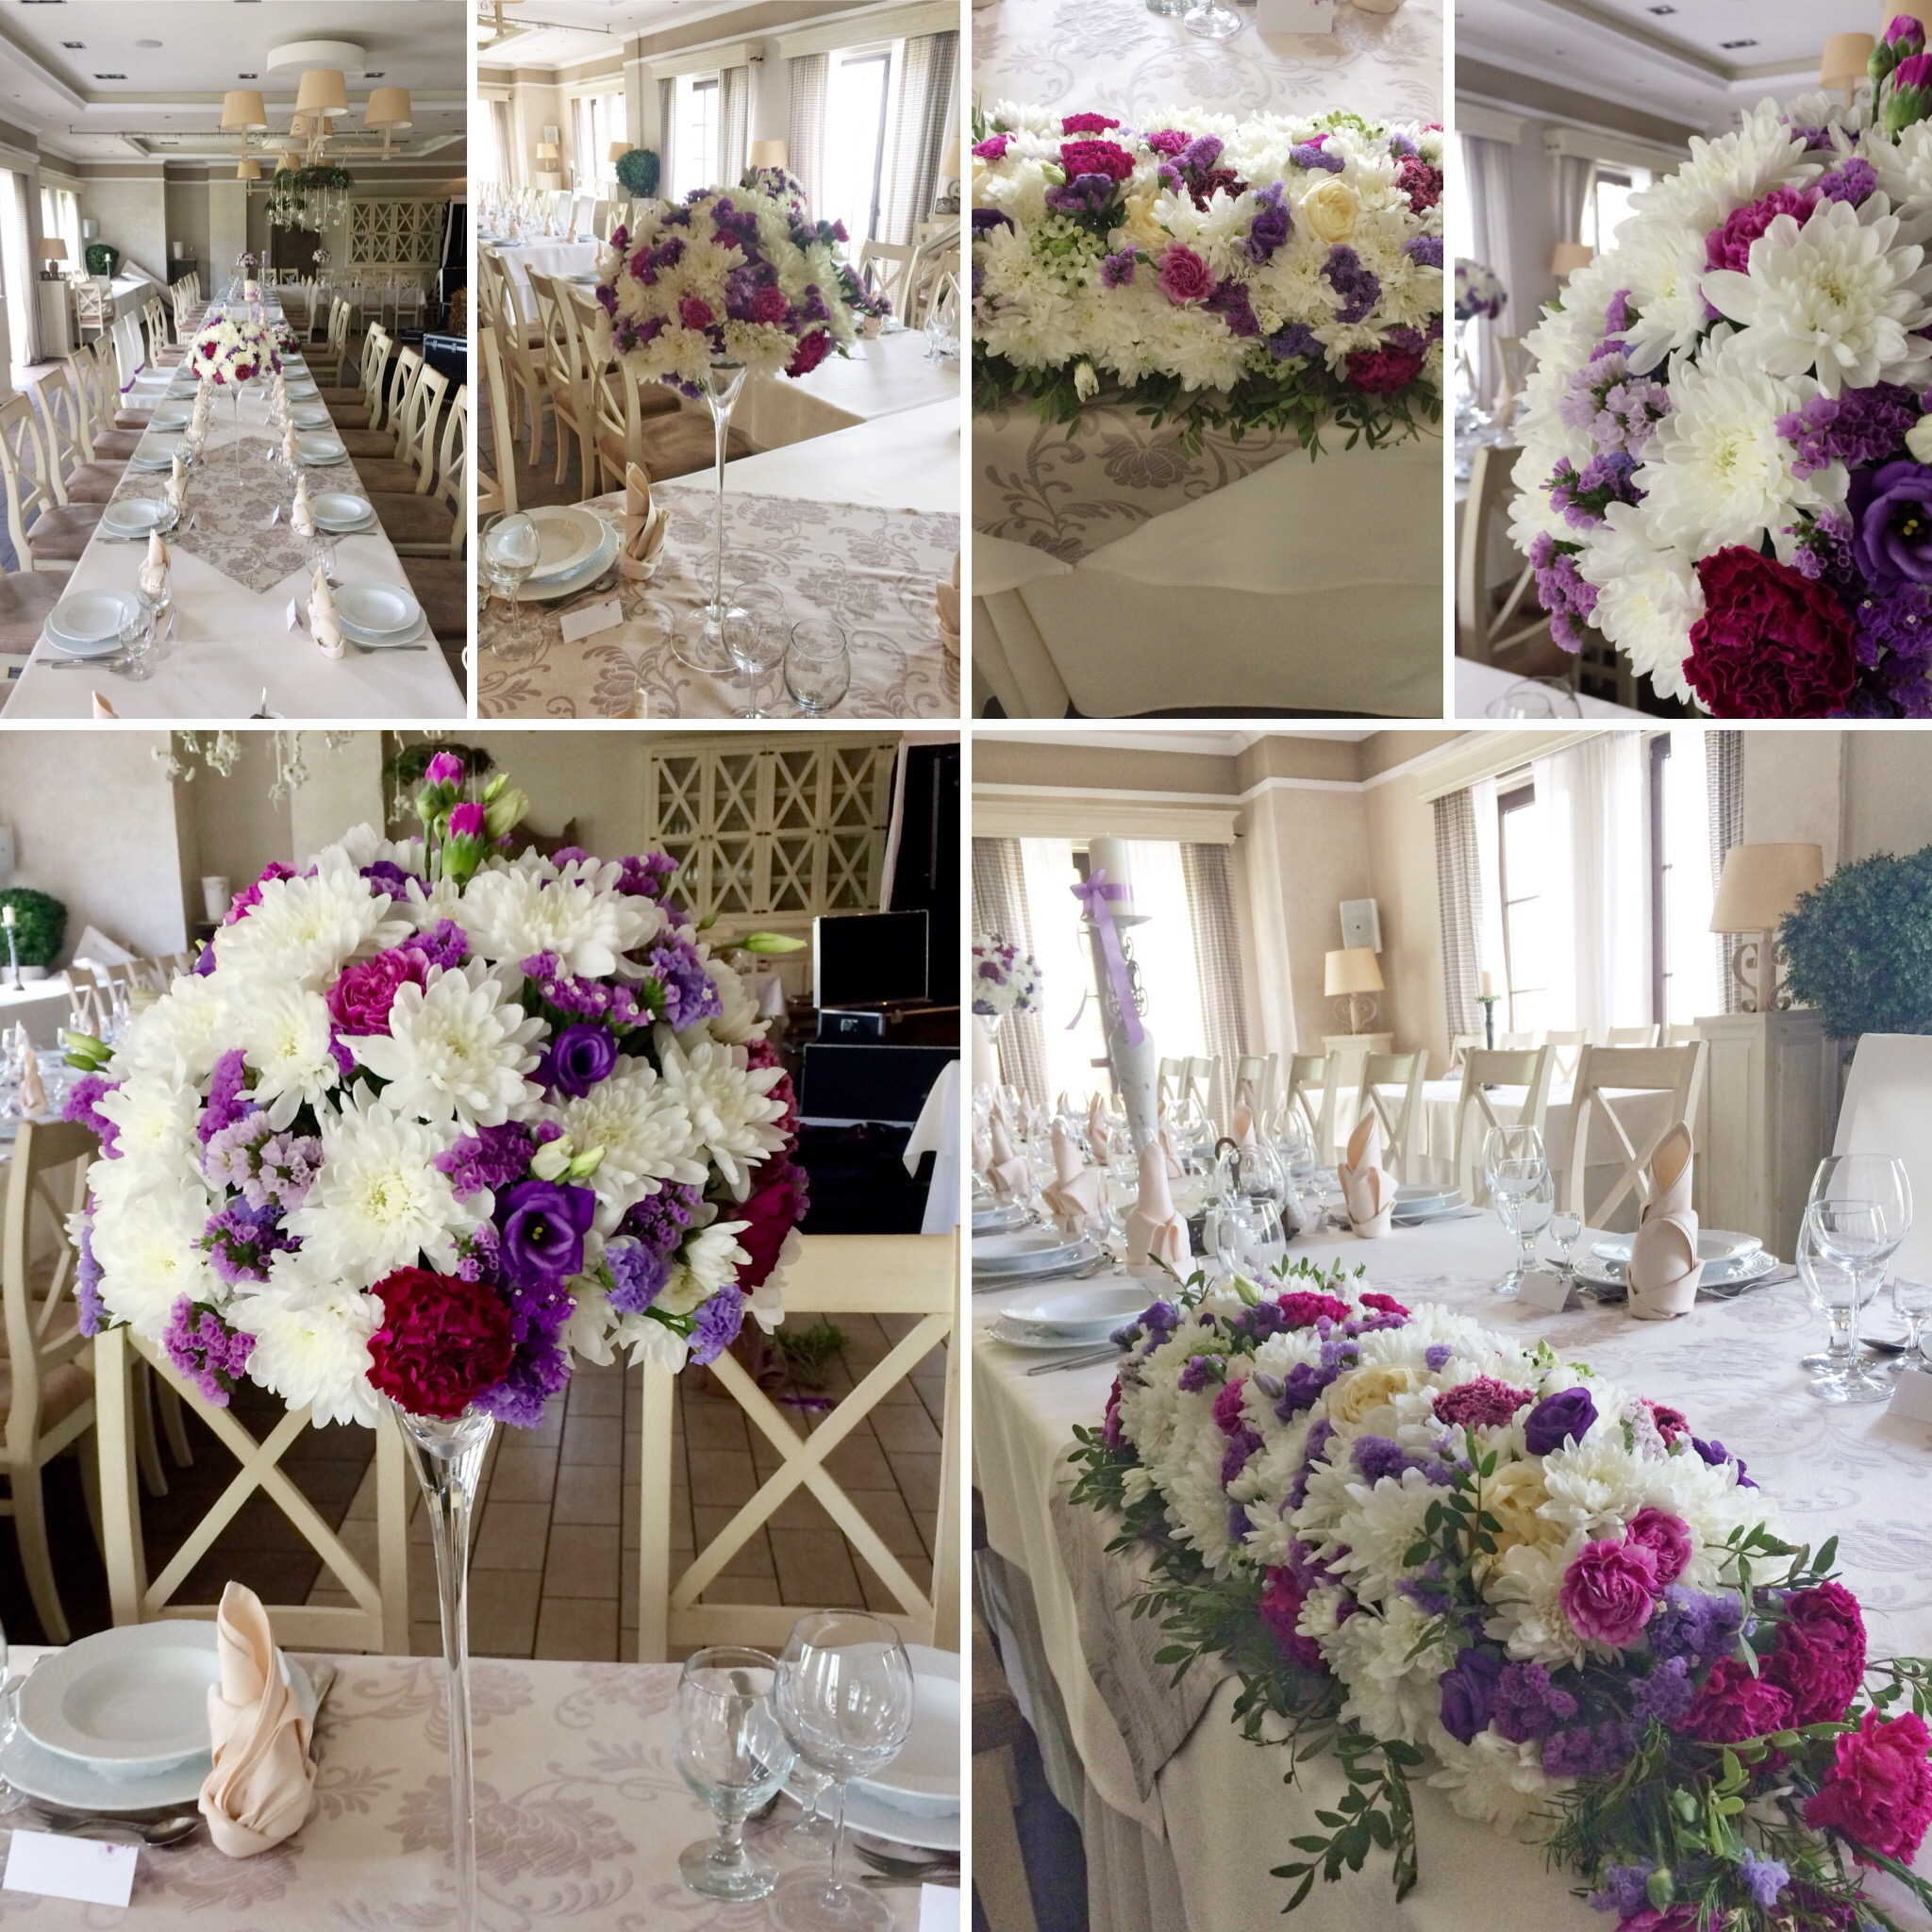 dekorkakatowice dekoracje wesele fioletowe-